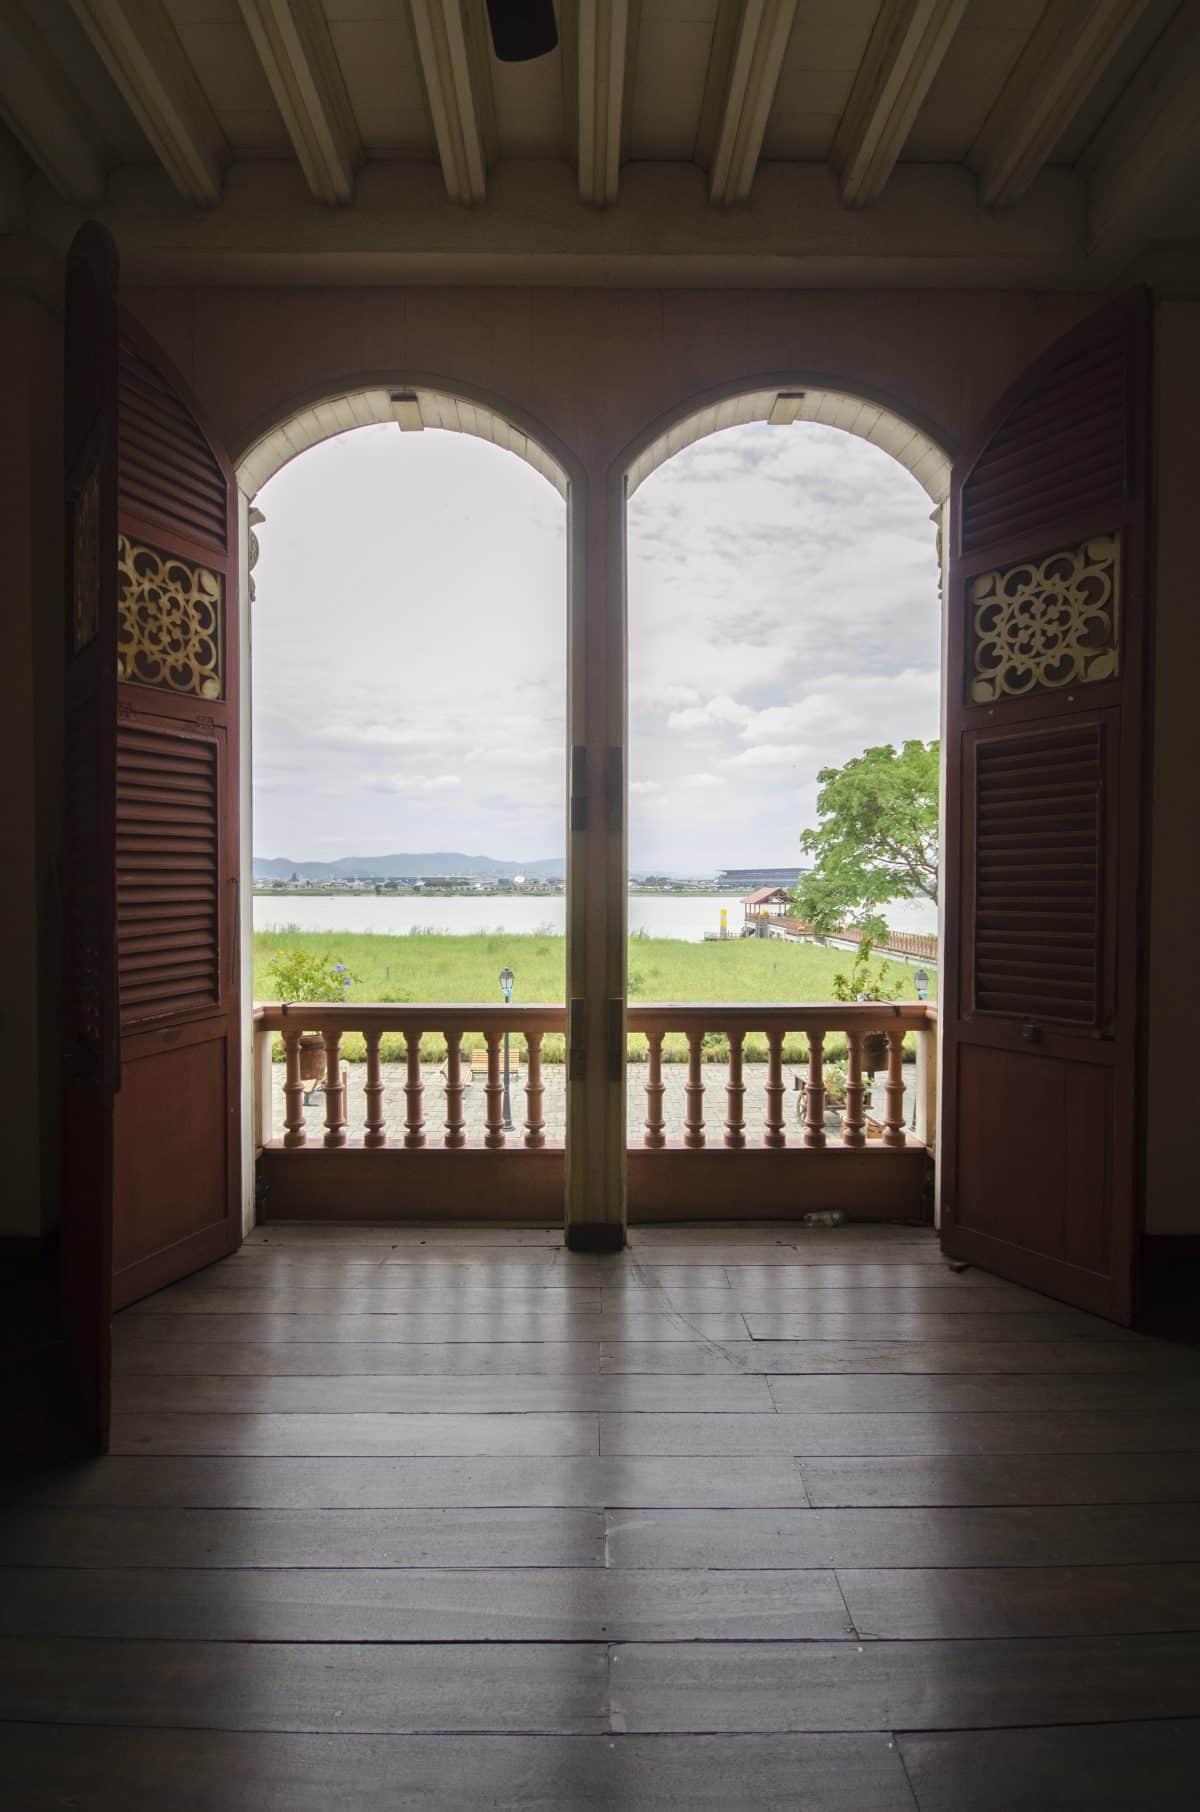 View from Historic Building, Parque Histórico, Guayaquil, Ecuador.